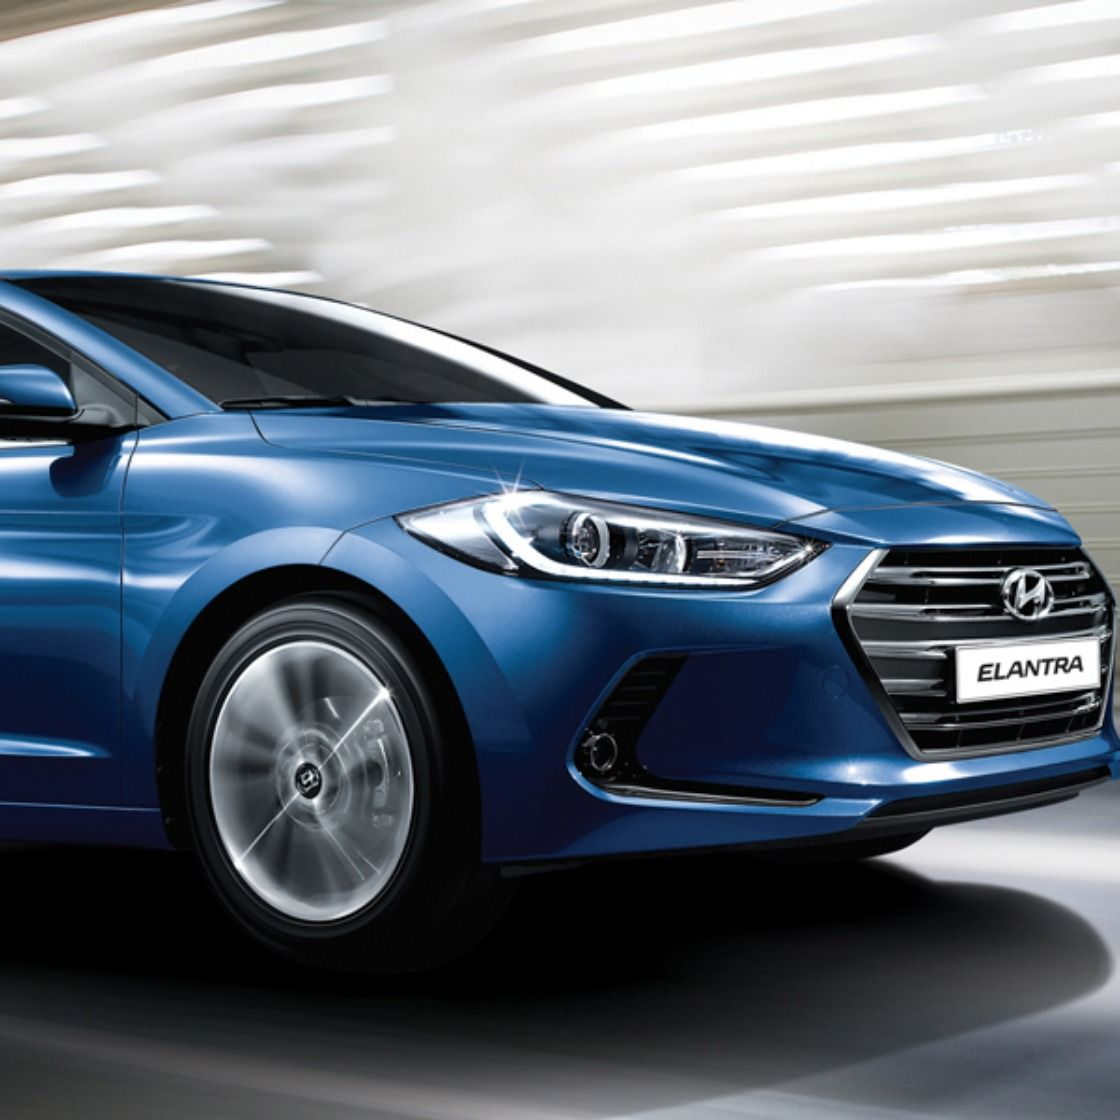 The Beauty Of A Sedan Hyundai Eleantra New Hyundai Cars Hyundai Cars New Hyundai